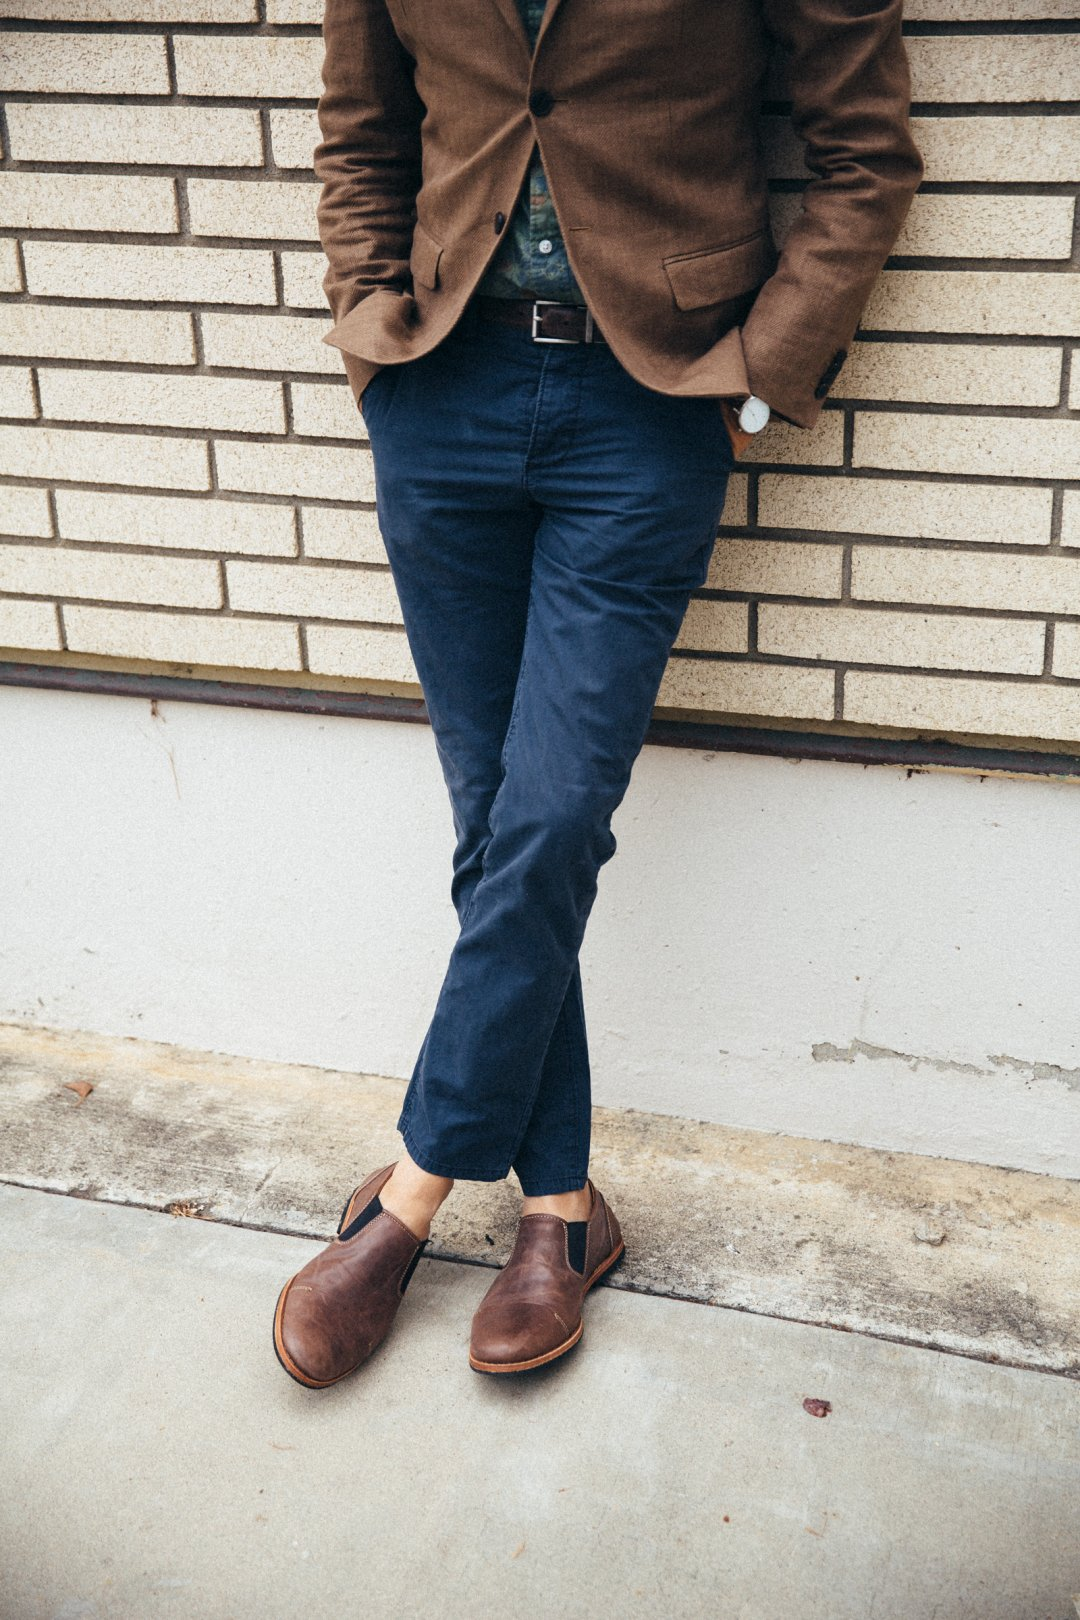 Timberland | Expert Advice No Socks No Problem